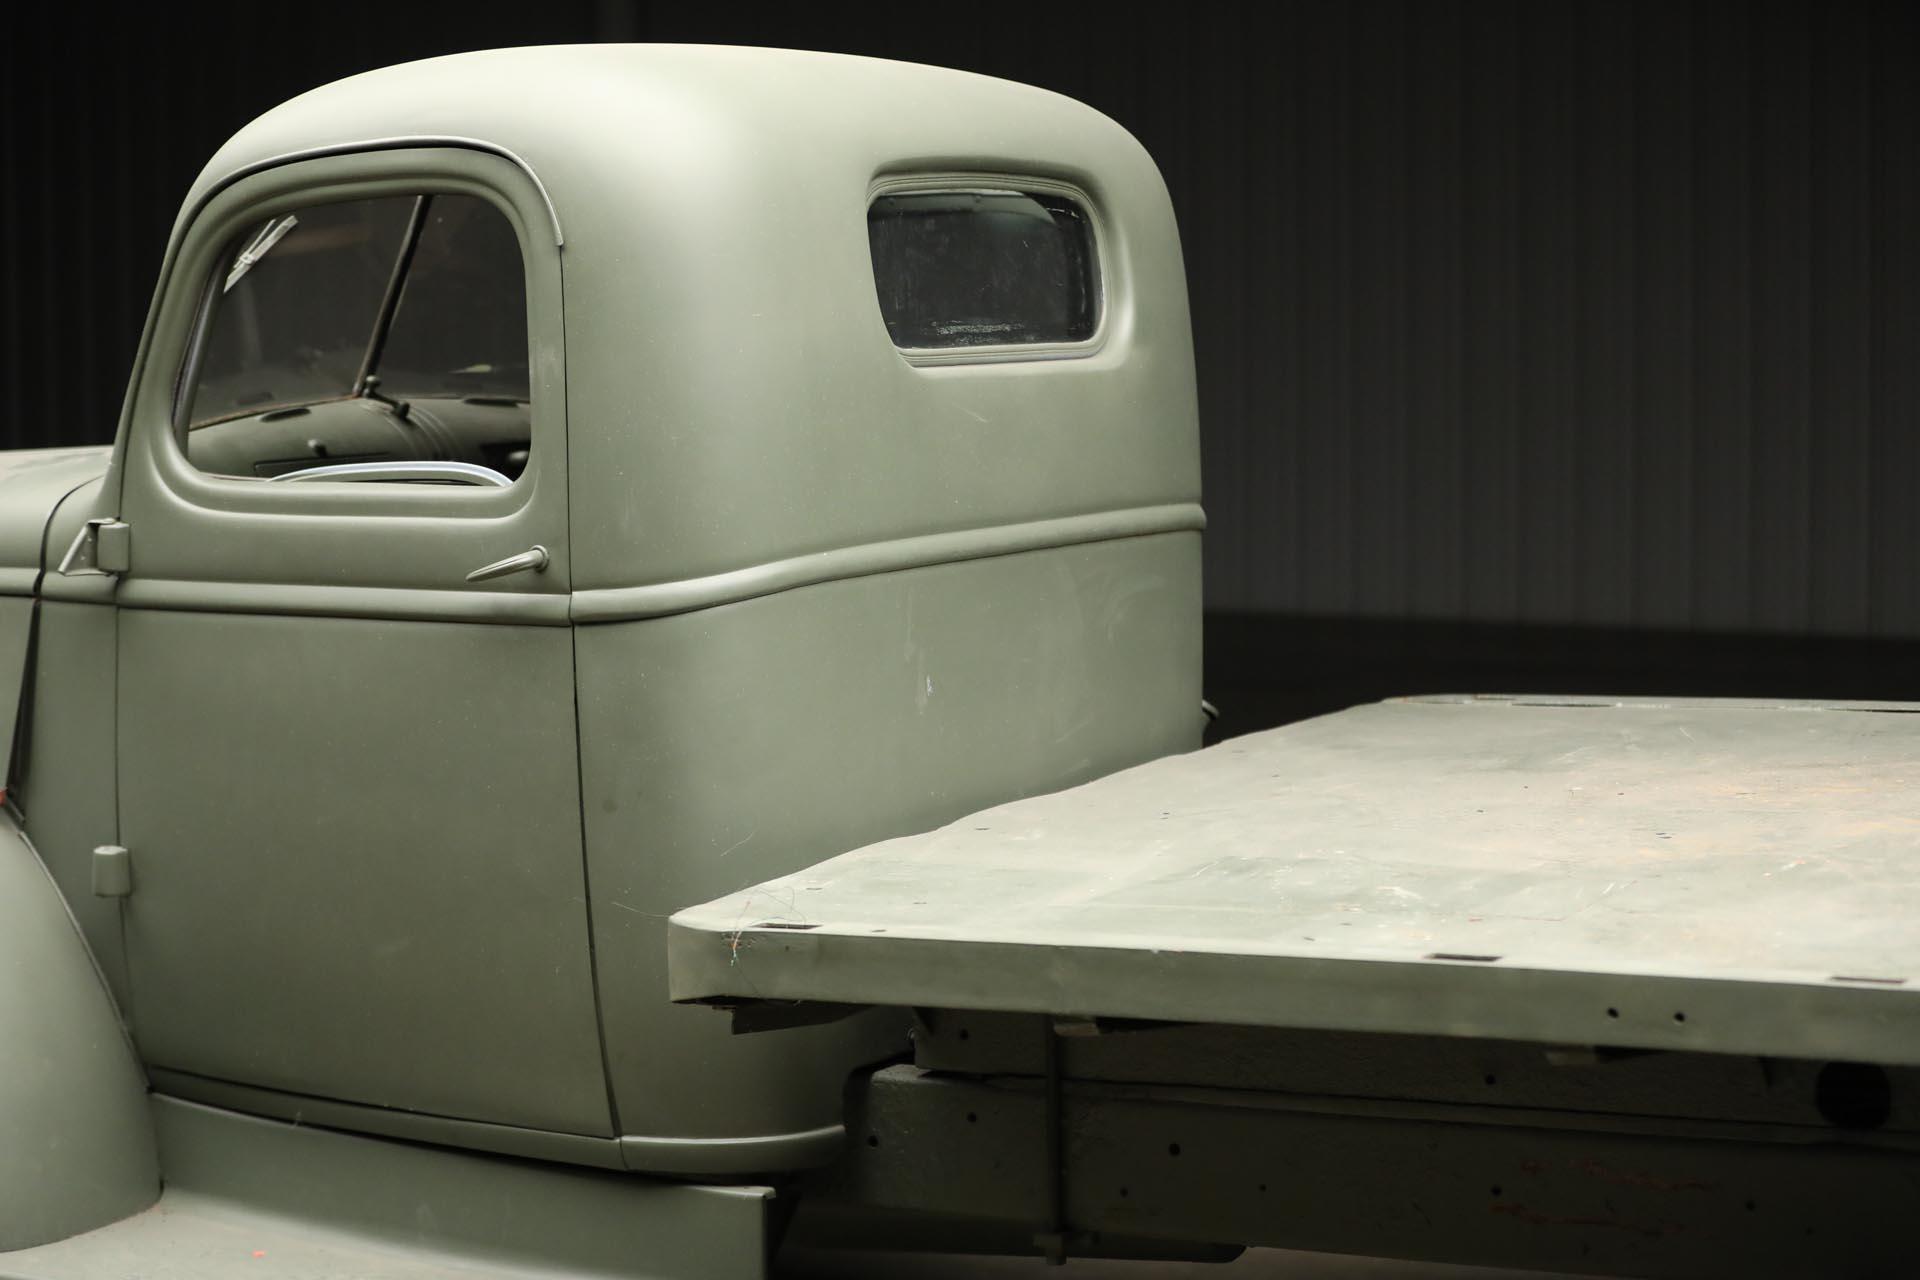 1941 Chevrolet 1543 GS Rear Cab